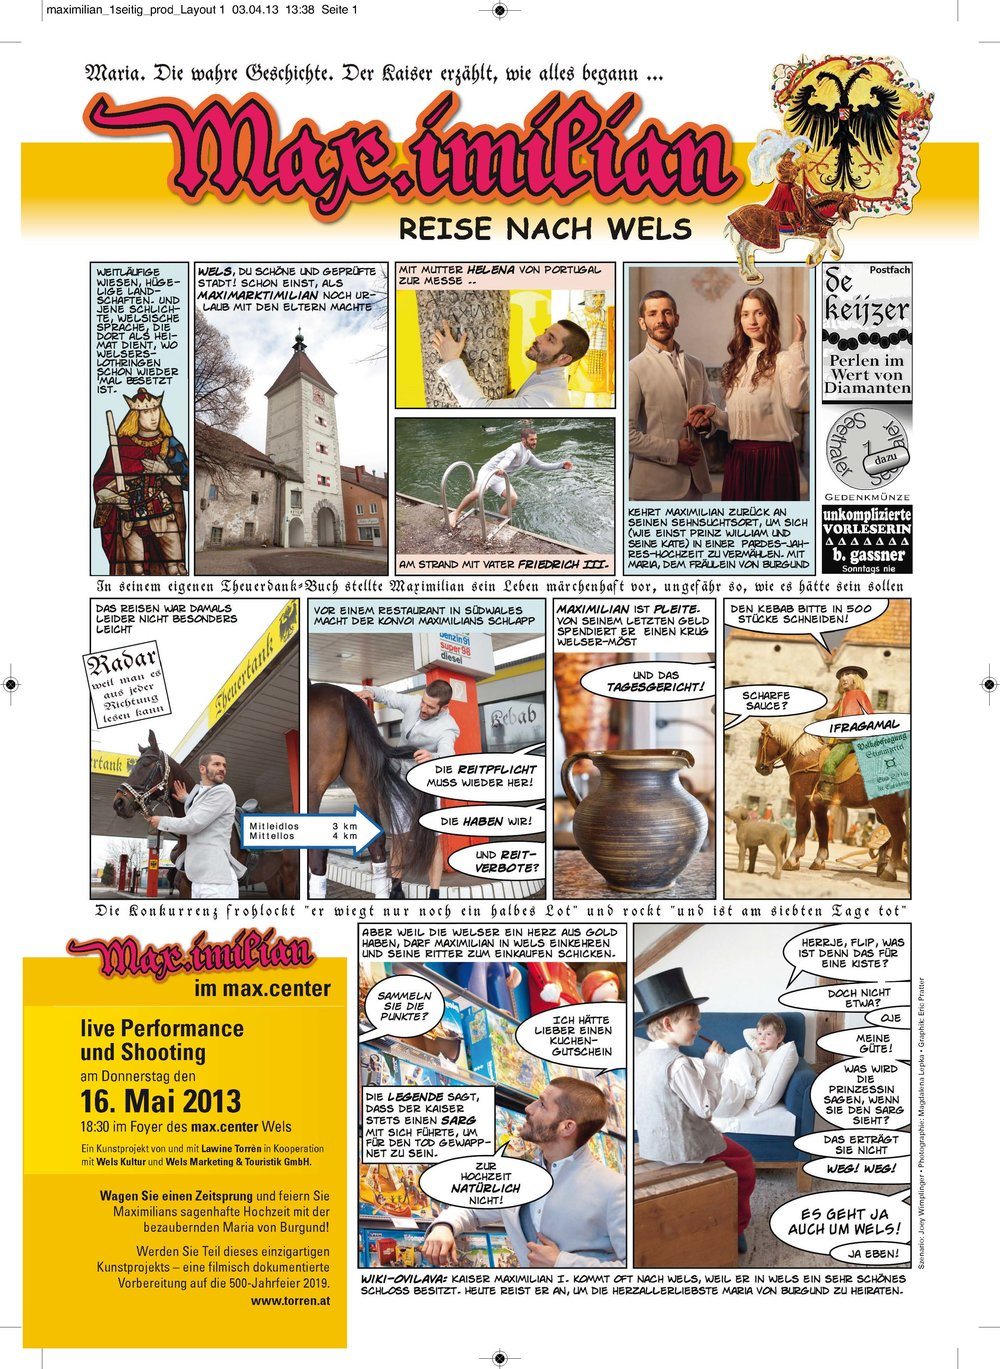 Comic Reise nach Wels